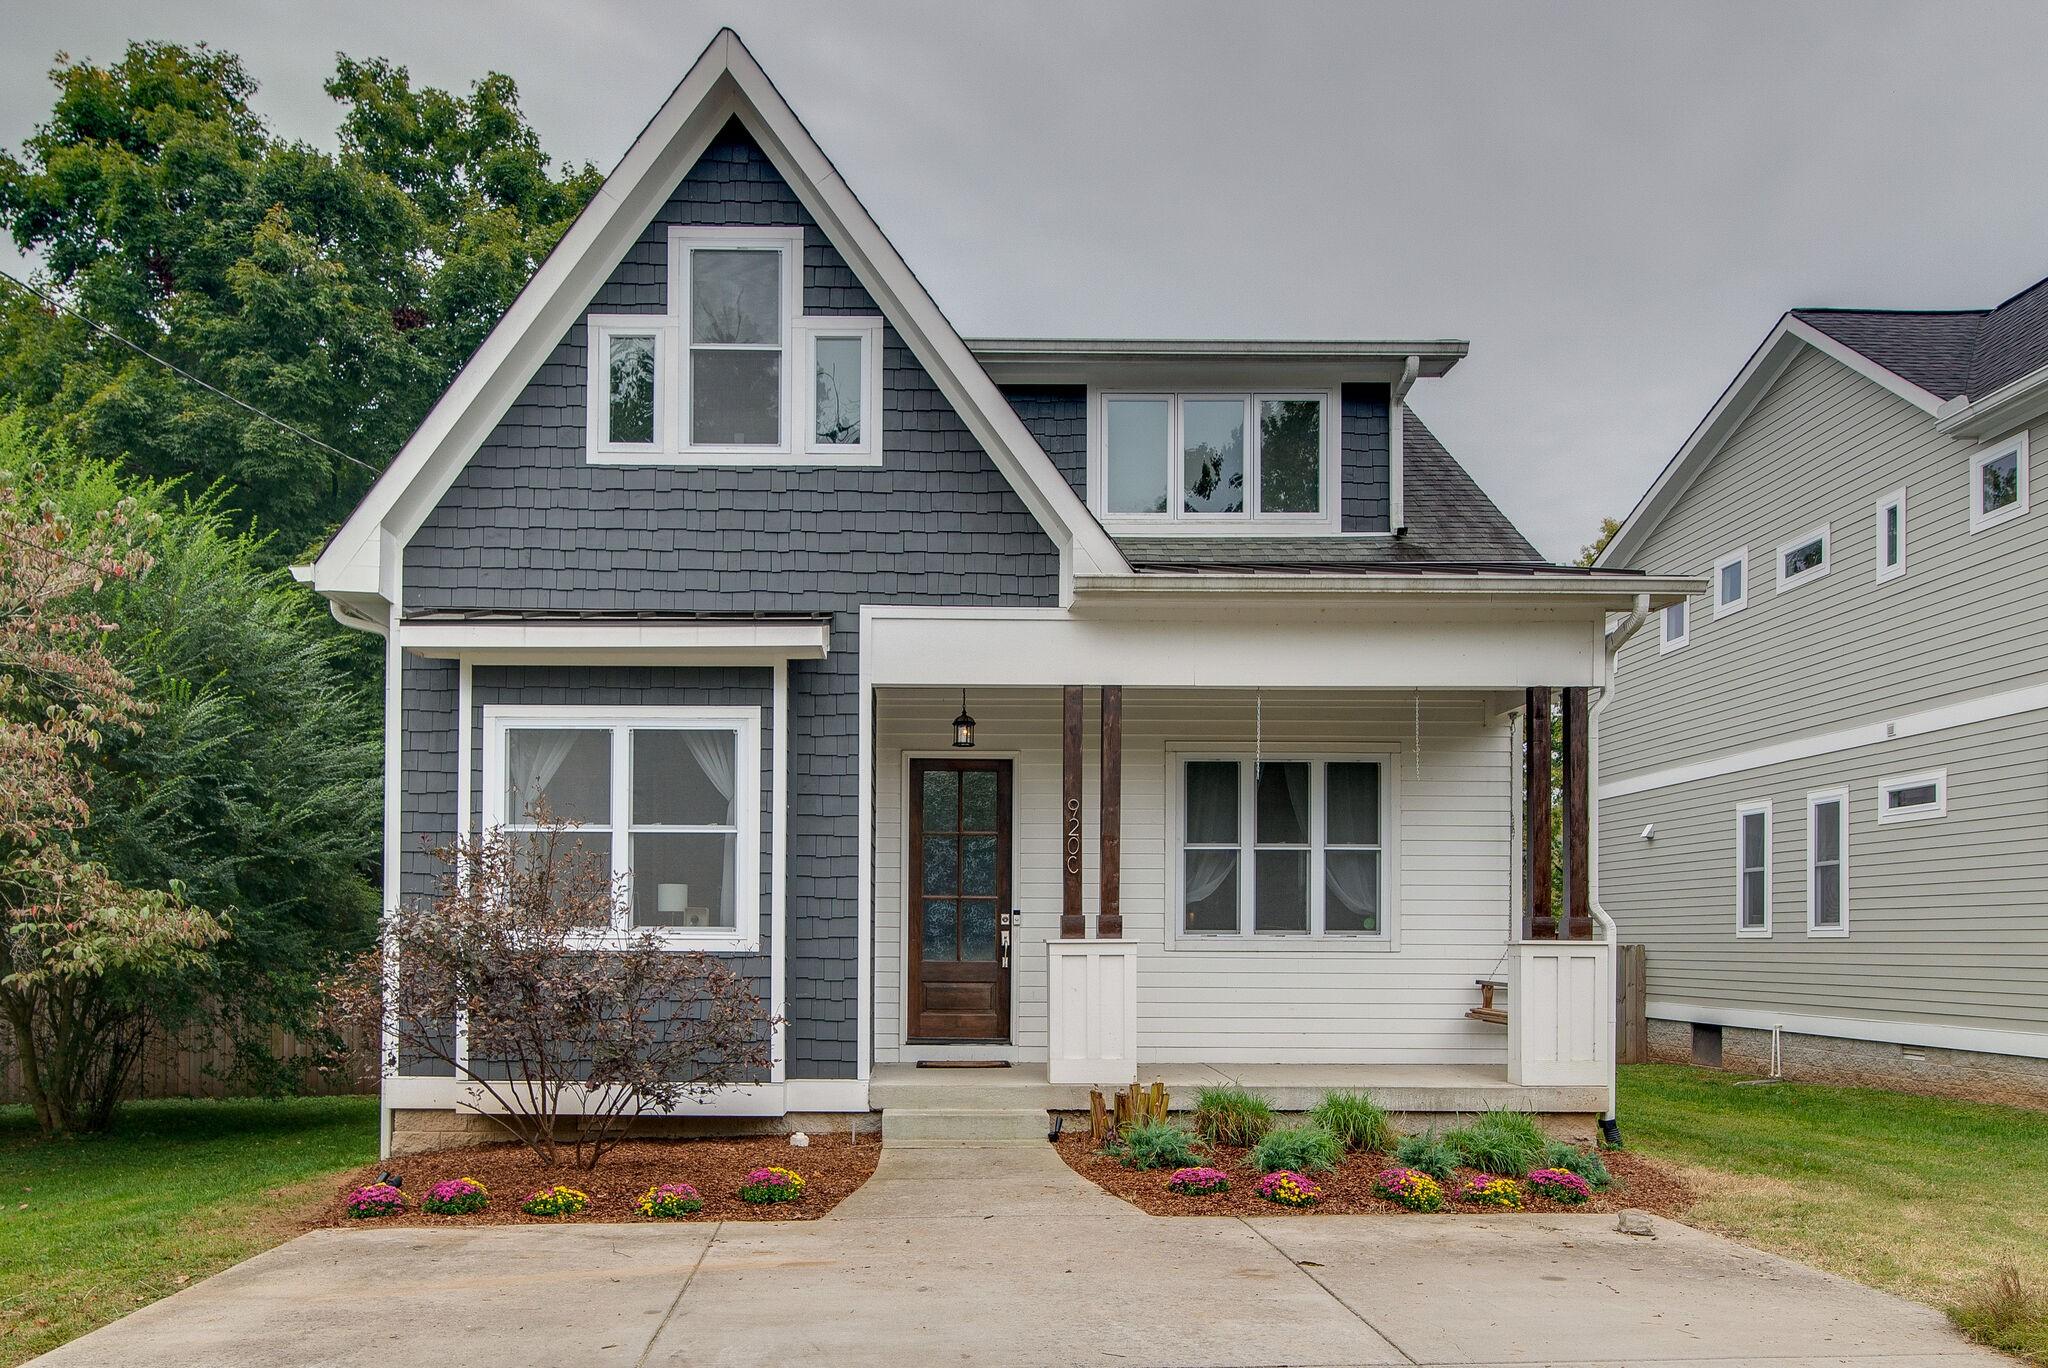 920C Curdwood Blvd Property Photo - Nashville, TN real estate listing